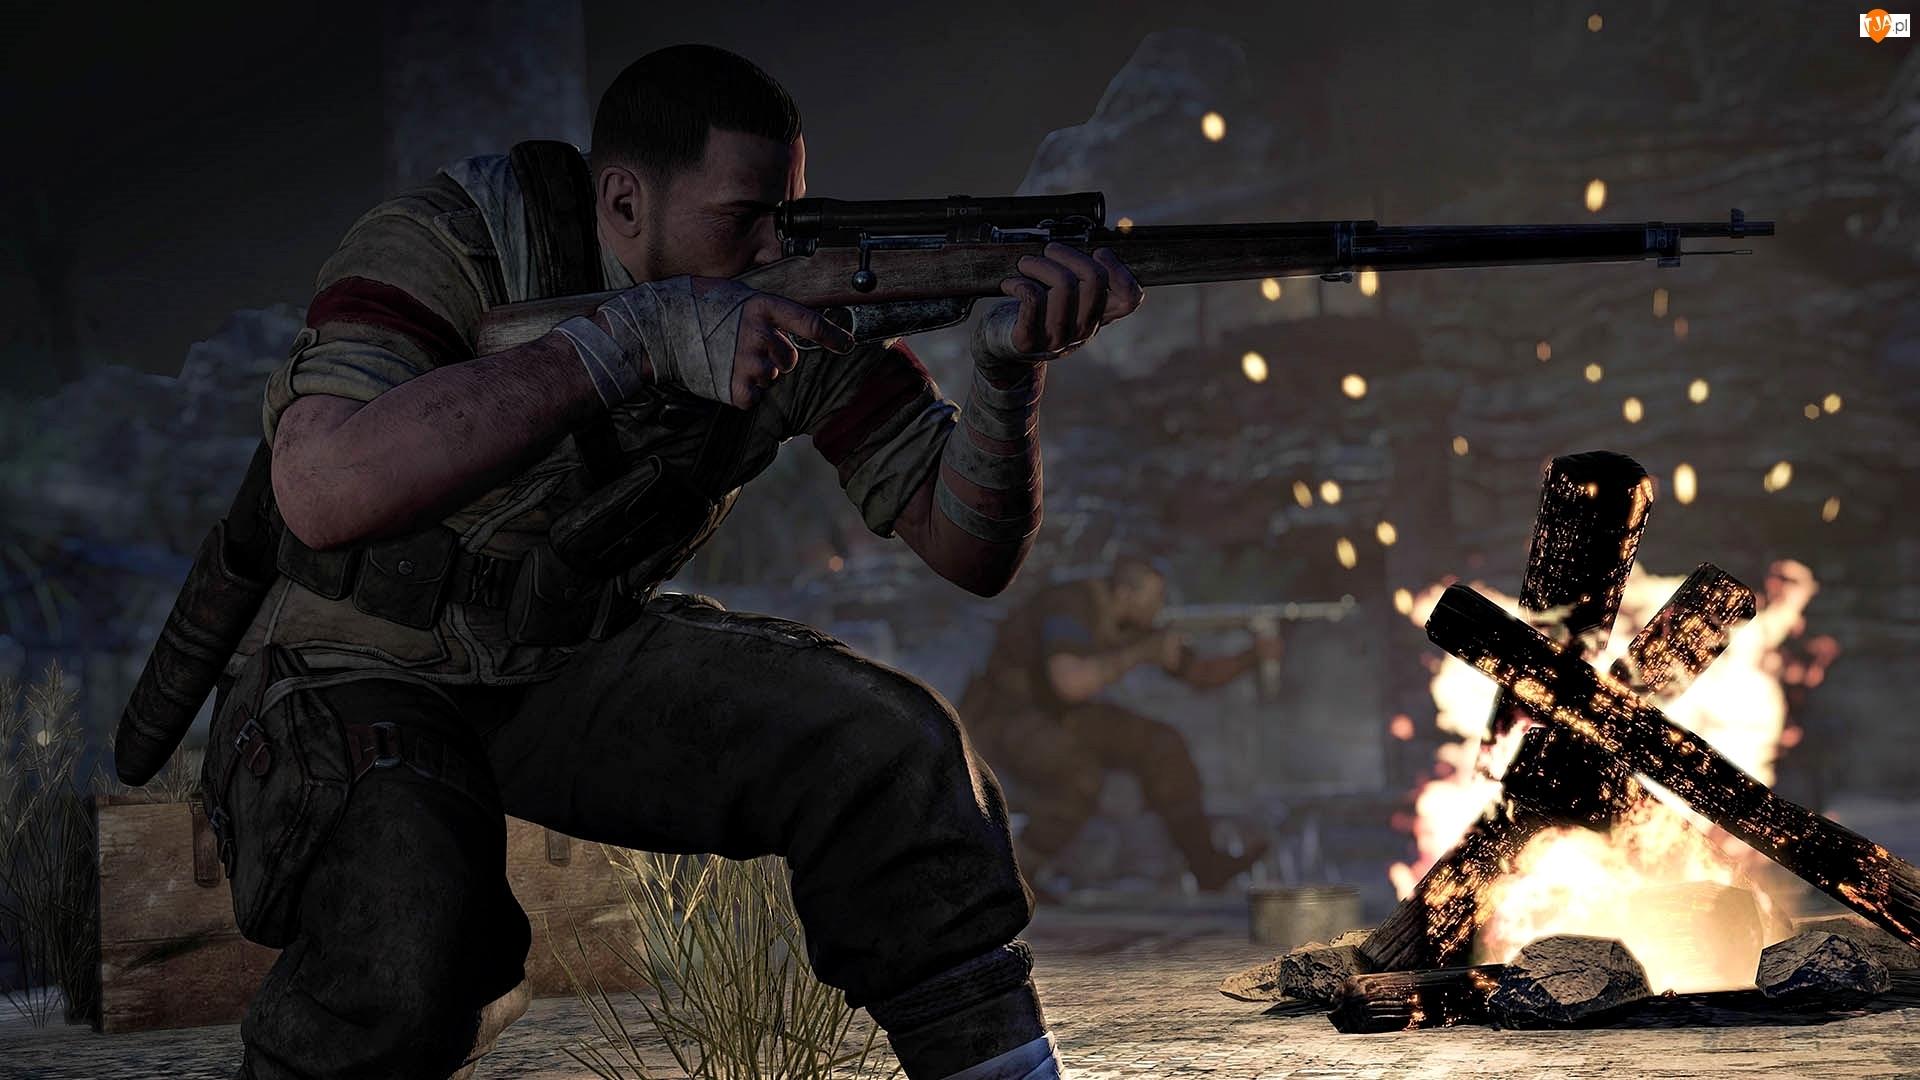 Gra, Sniper Elite 3: Afrika, Snajper, Karl Fairburne